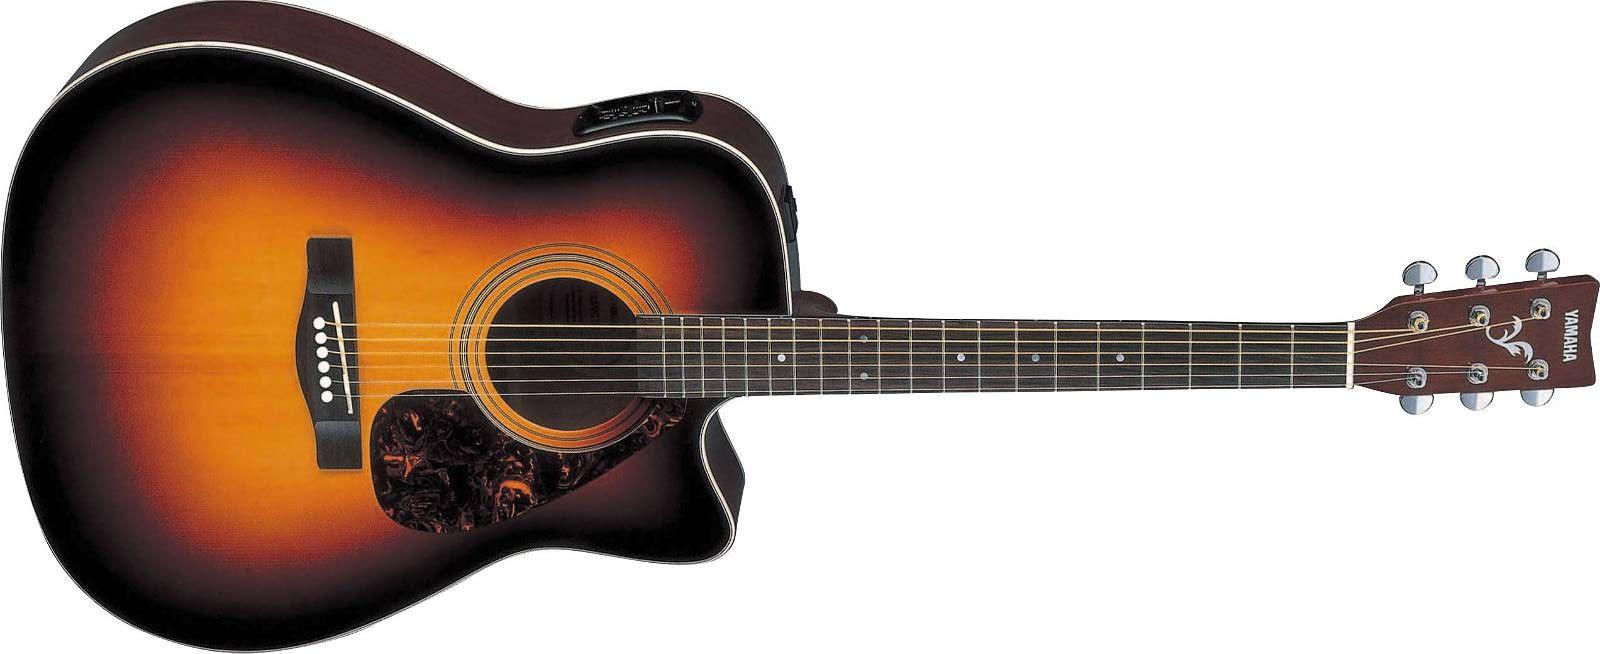 Yamaha FX-370 C TBS Akustik Gitarre Dreadnought